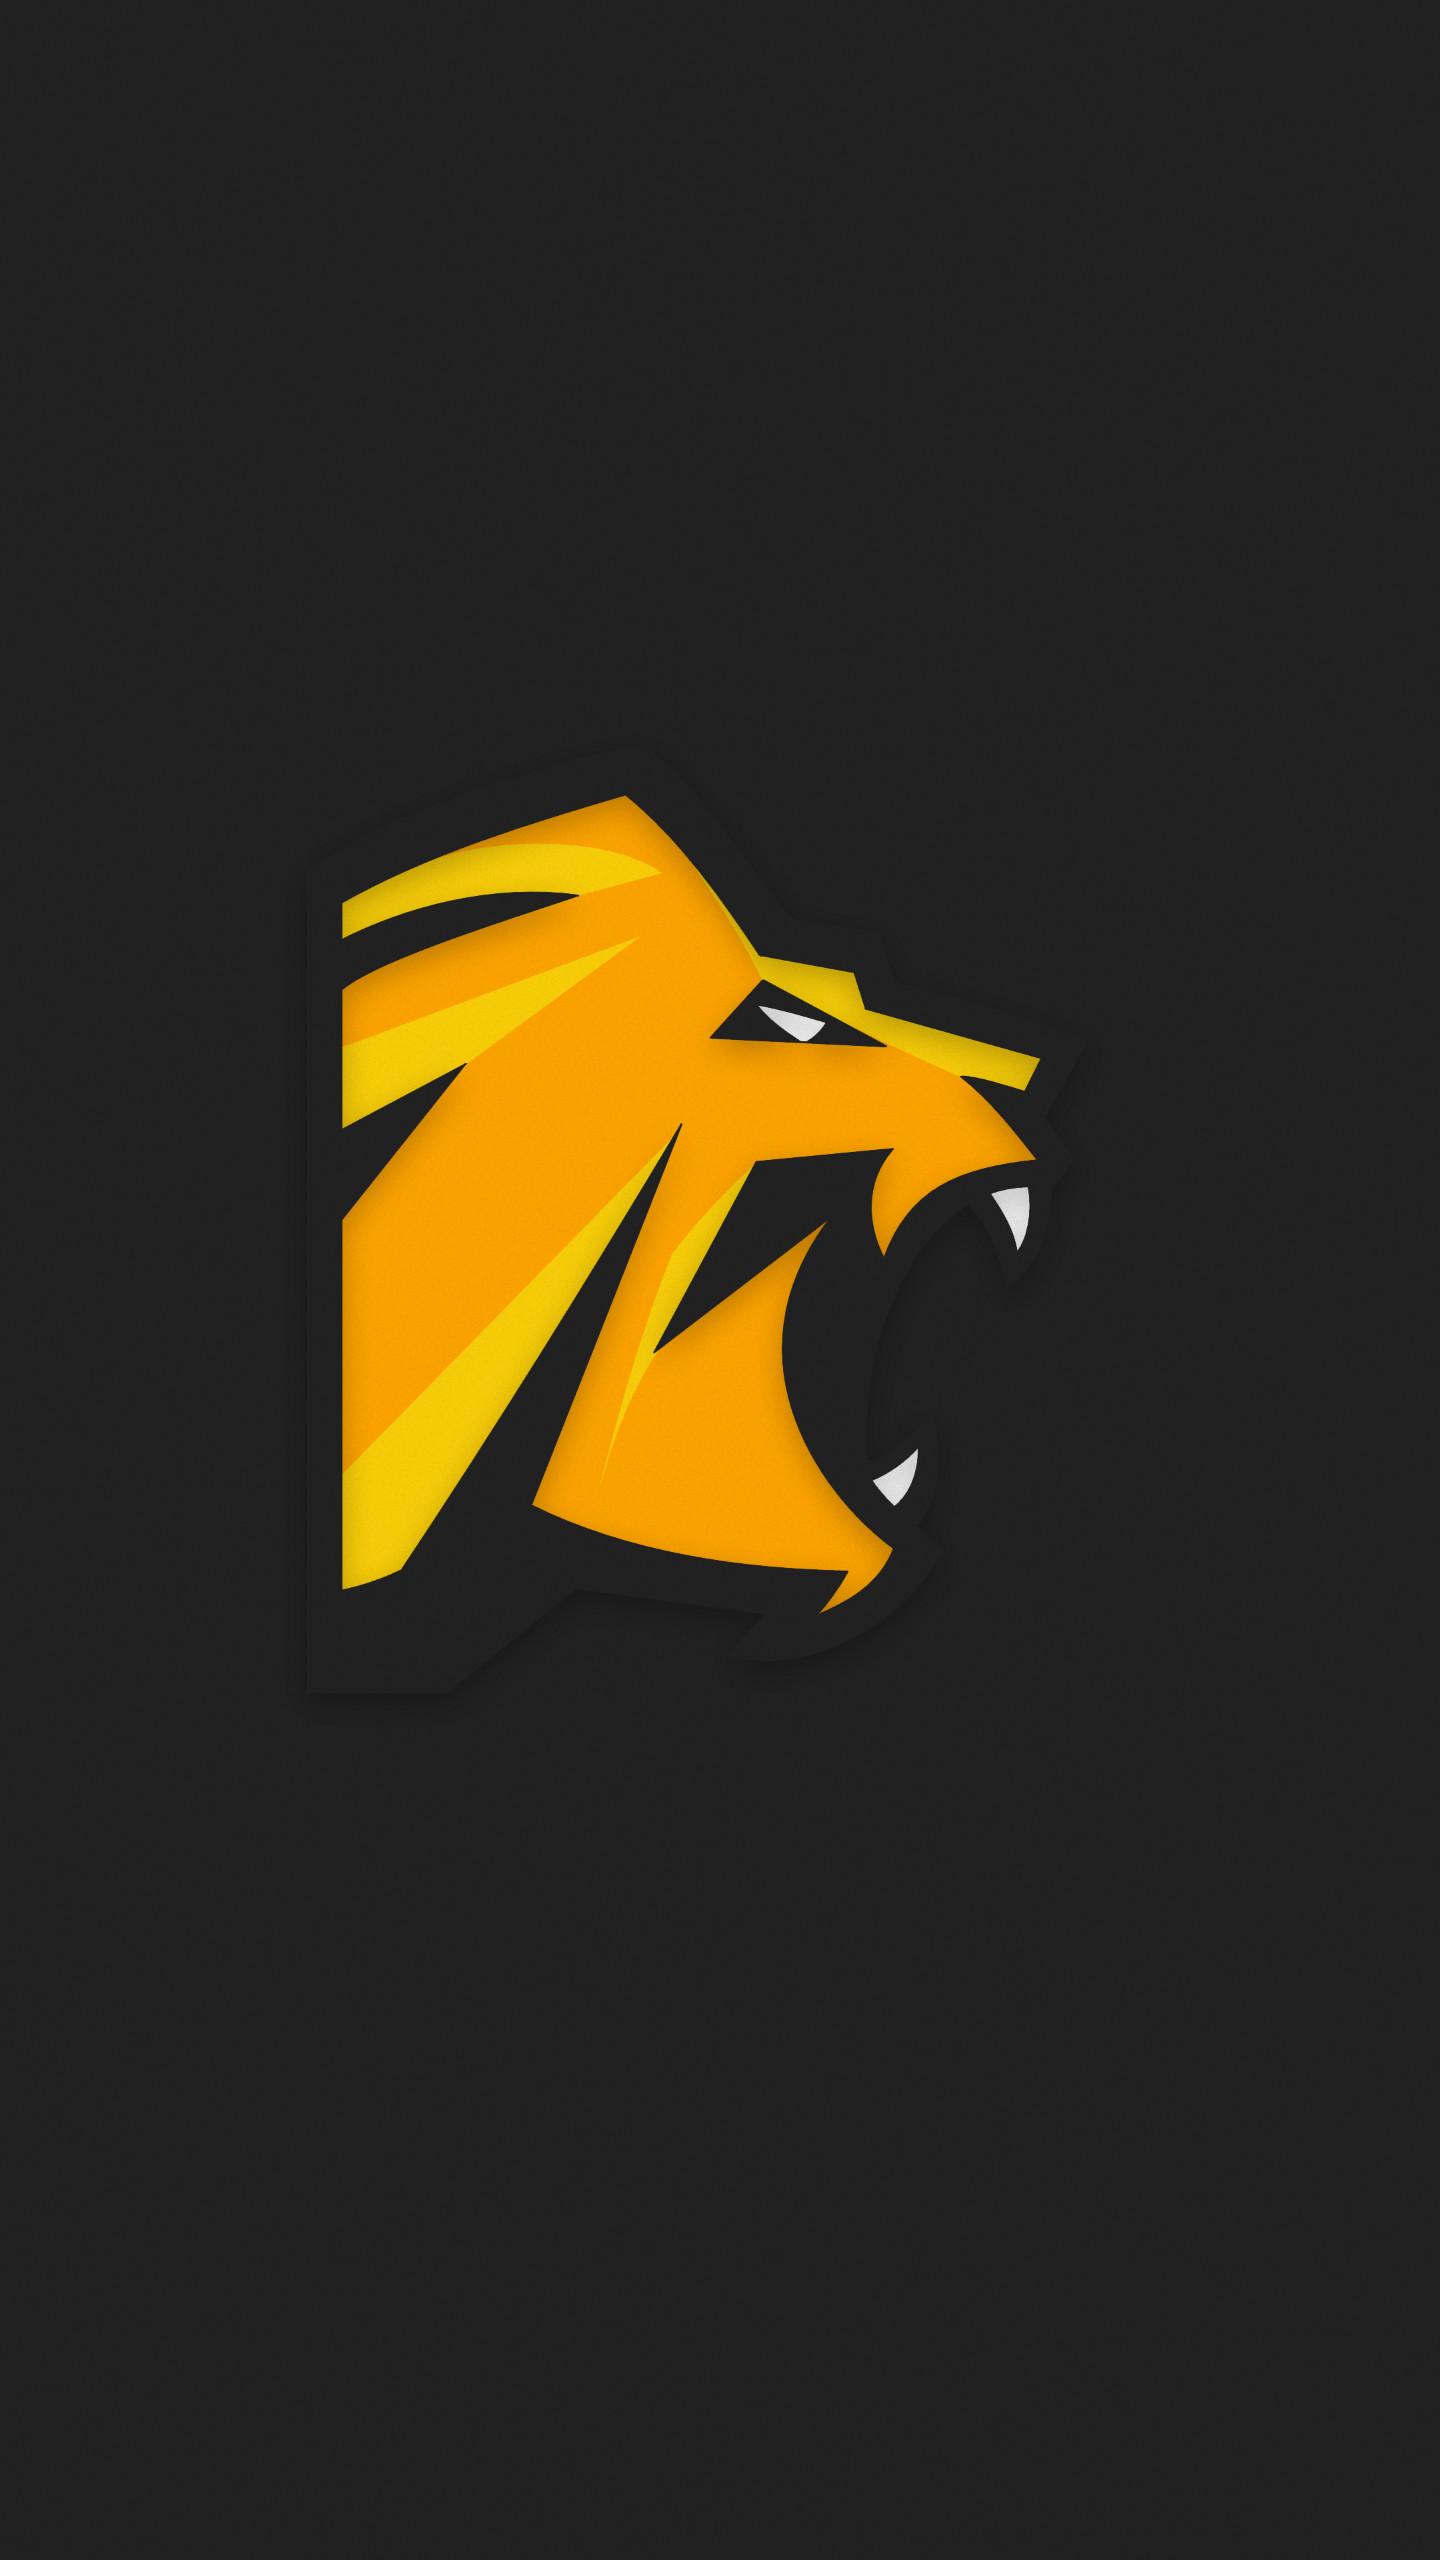 ArtStation - Lion Icon Wallpaper Pack, Jarvis XCIV